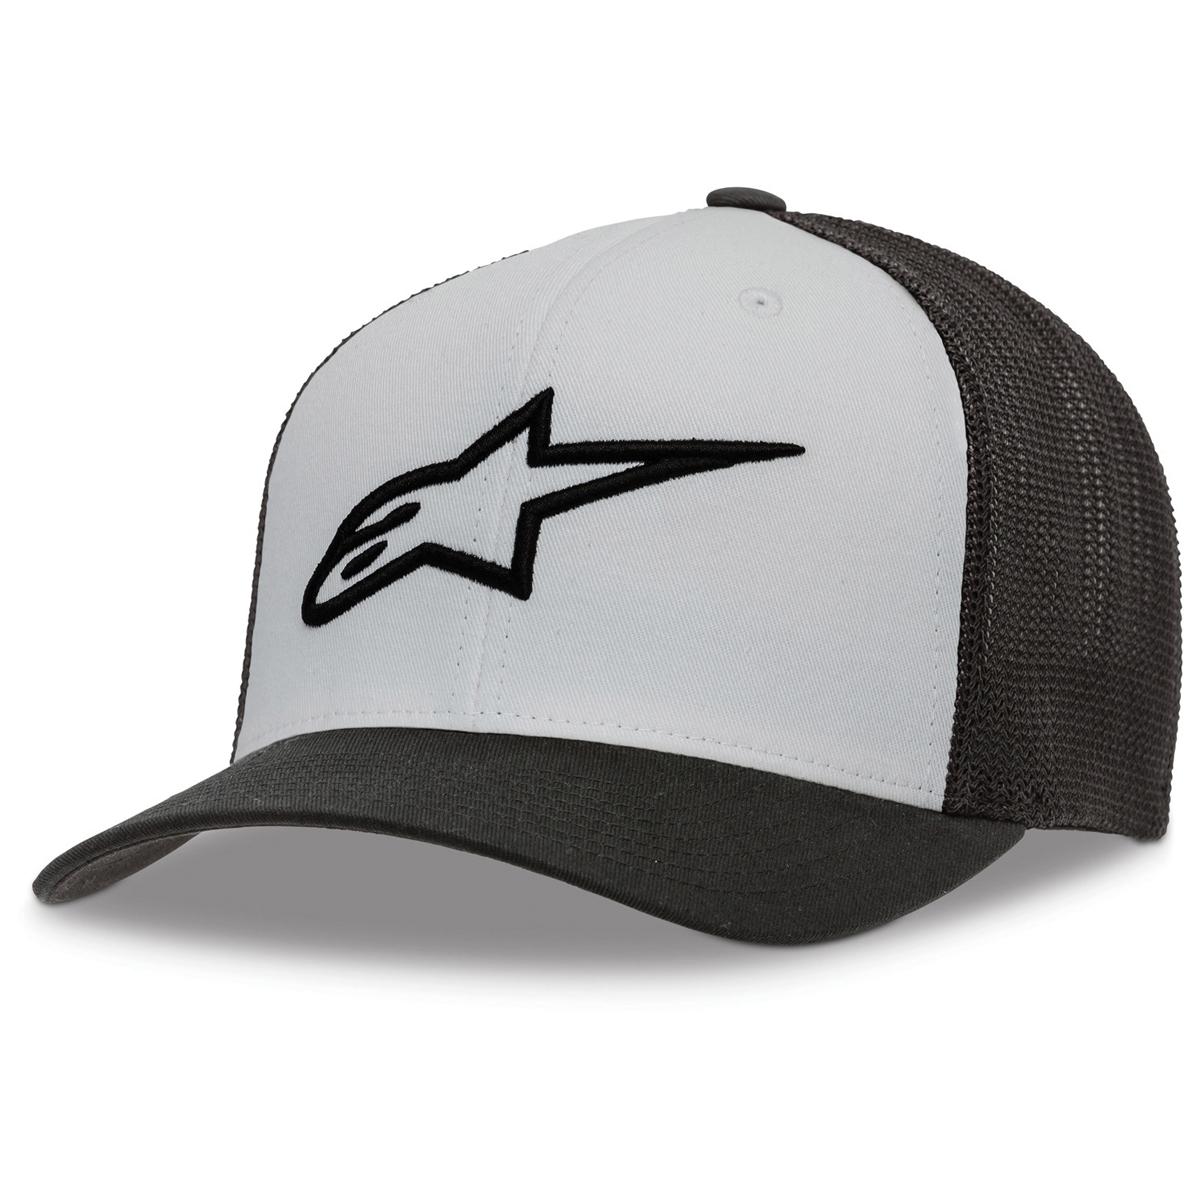 Alpinestars Women's Ageless White Mesh Hat